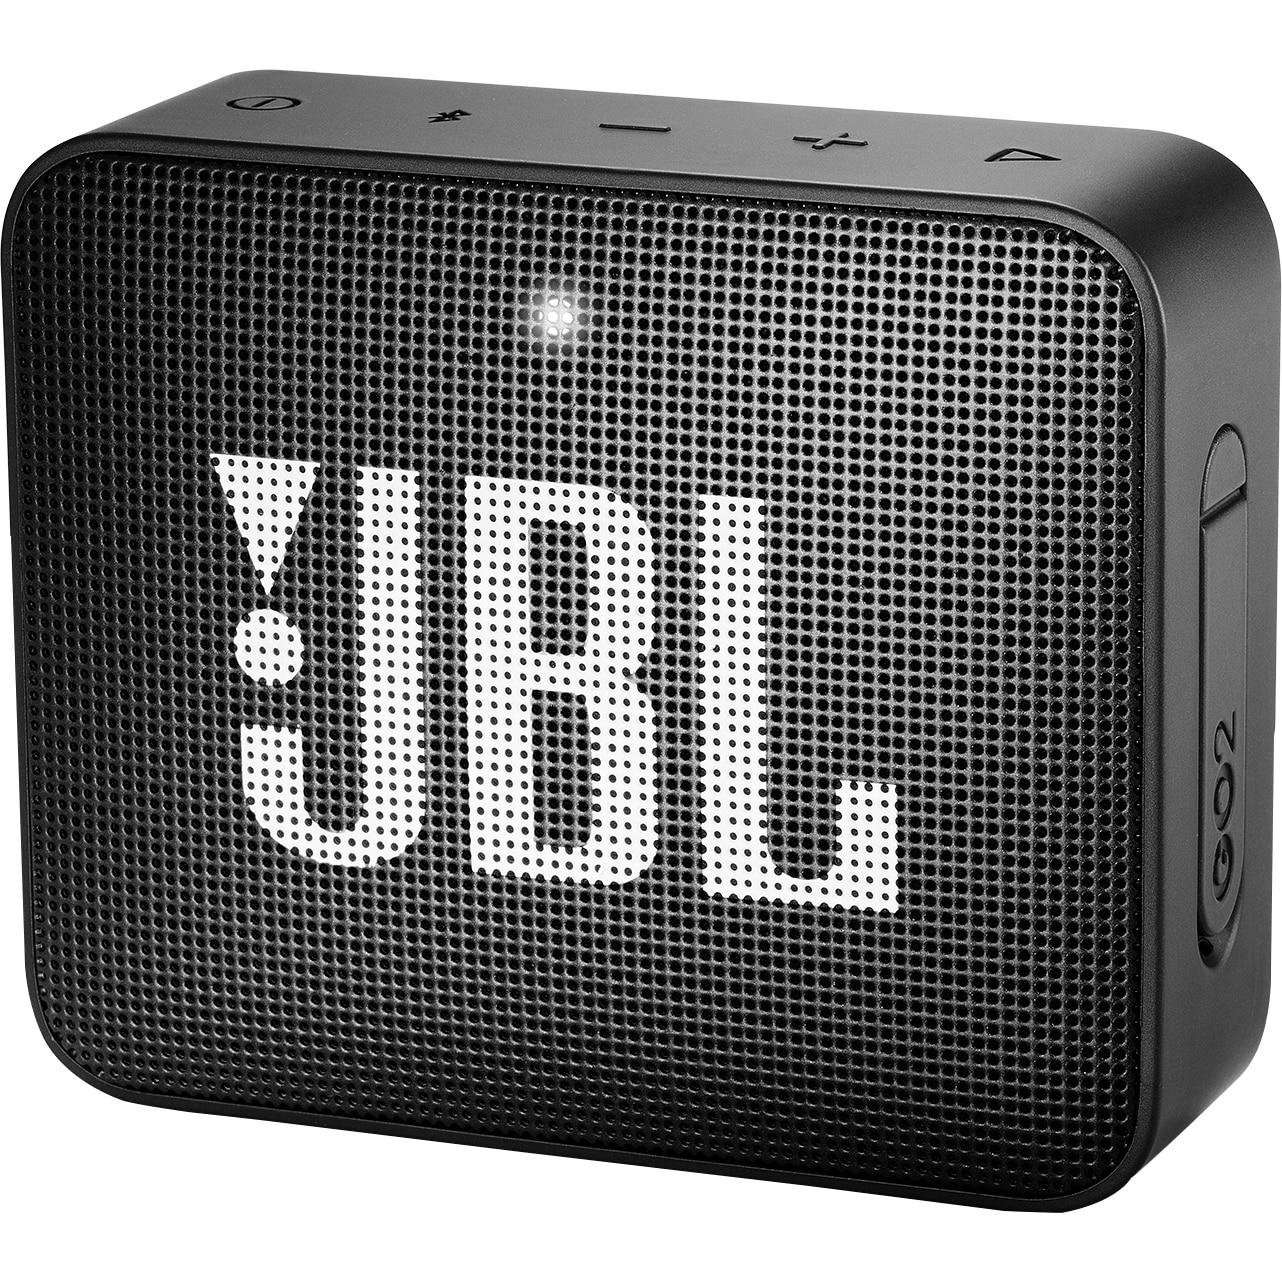 Fotografie Boxa portabila JBL Go2, IPX7, negru